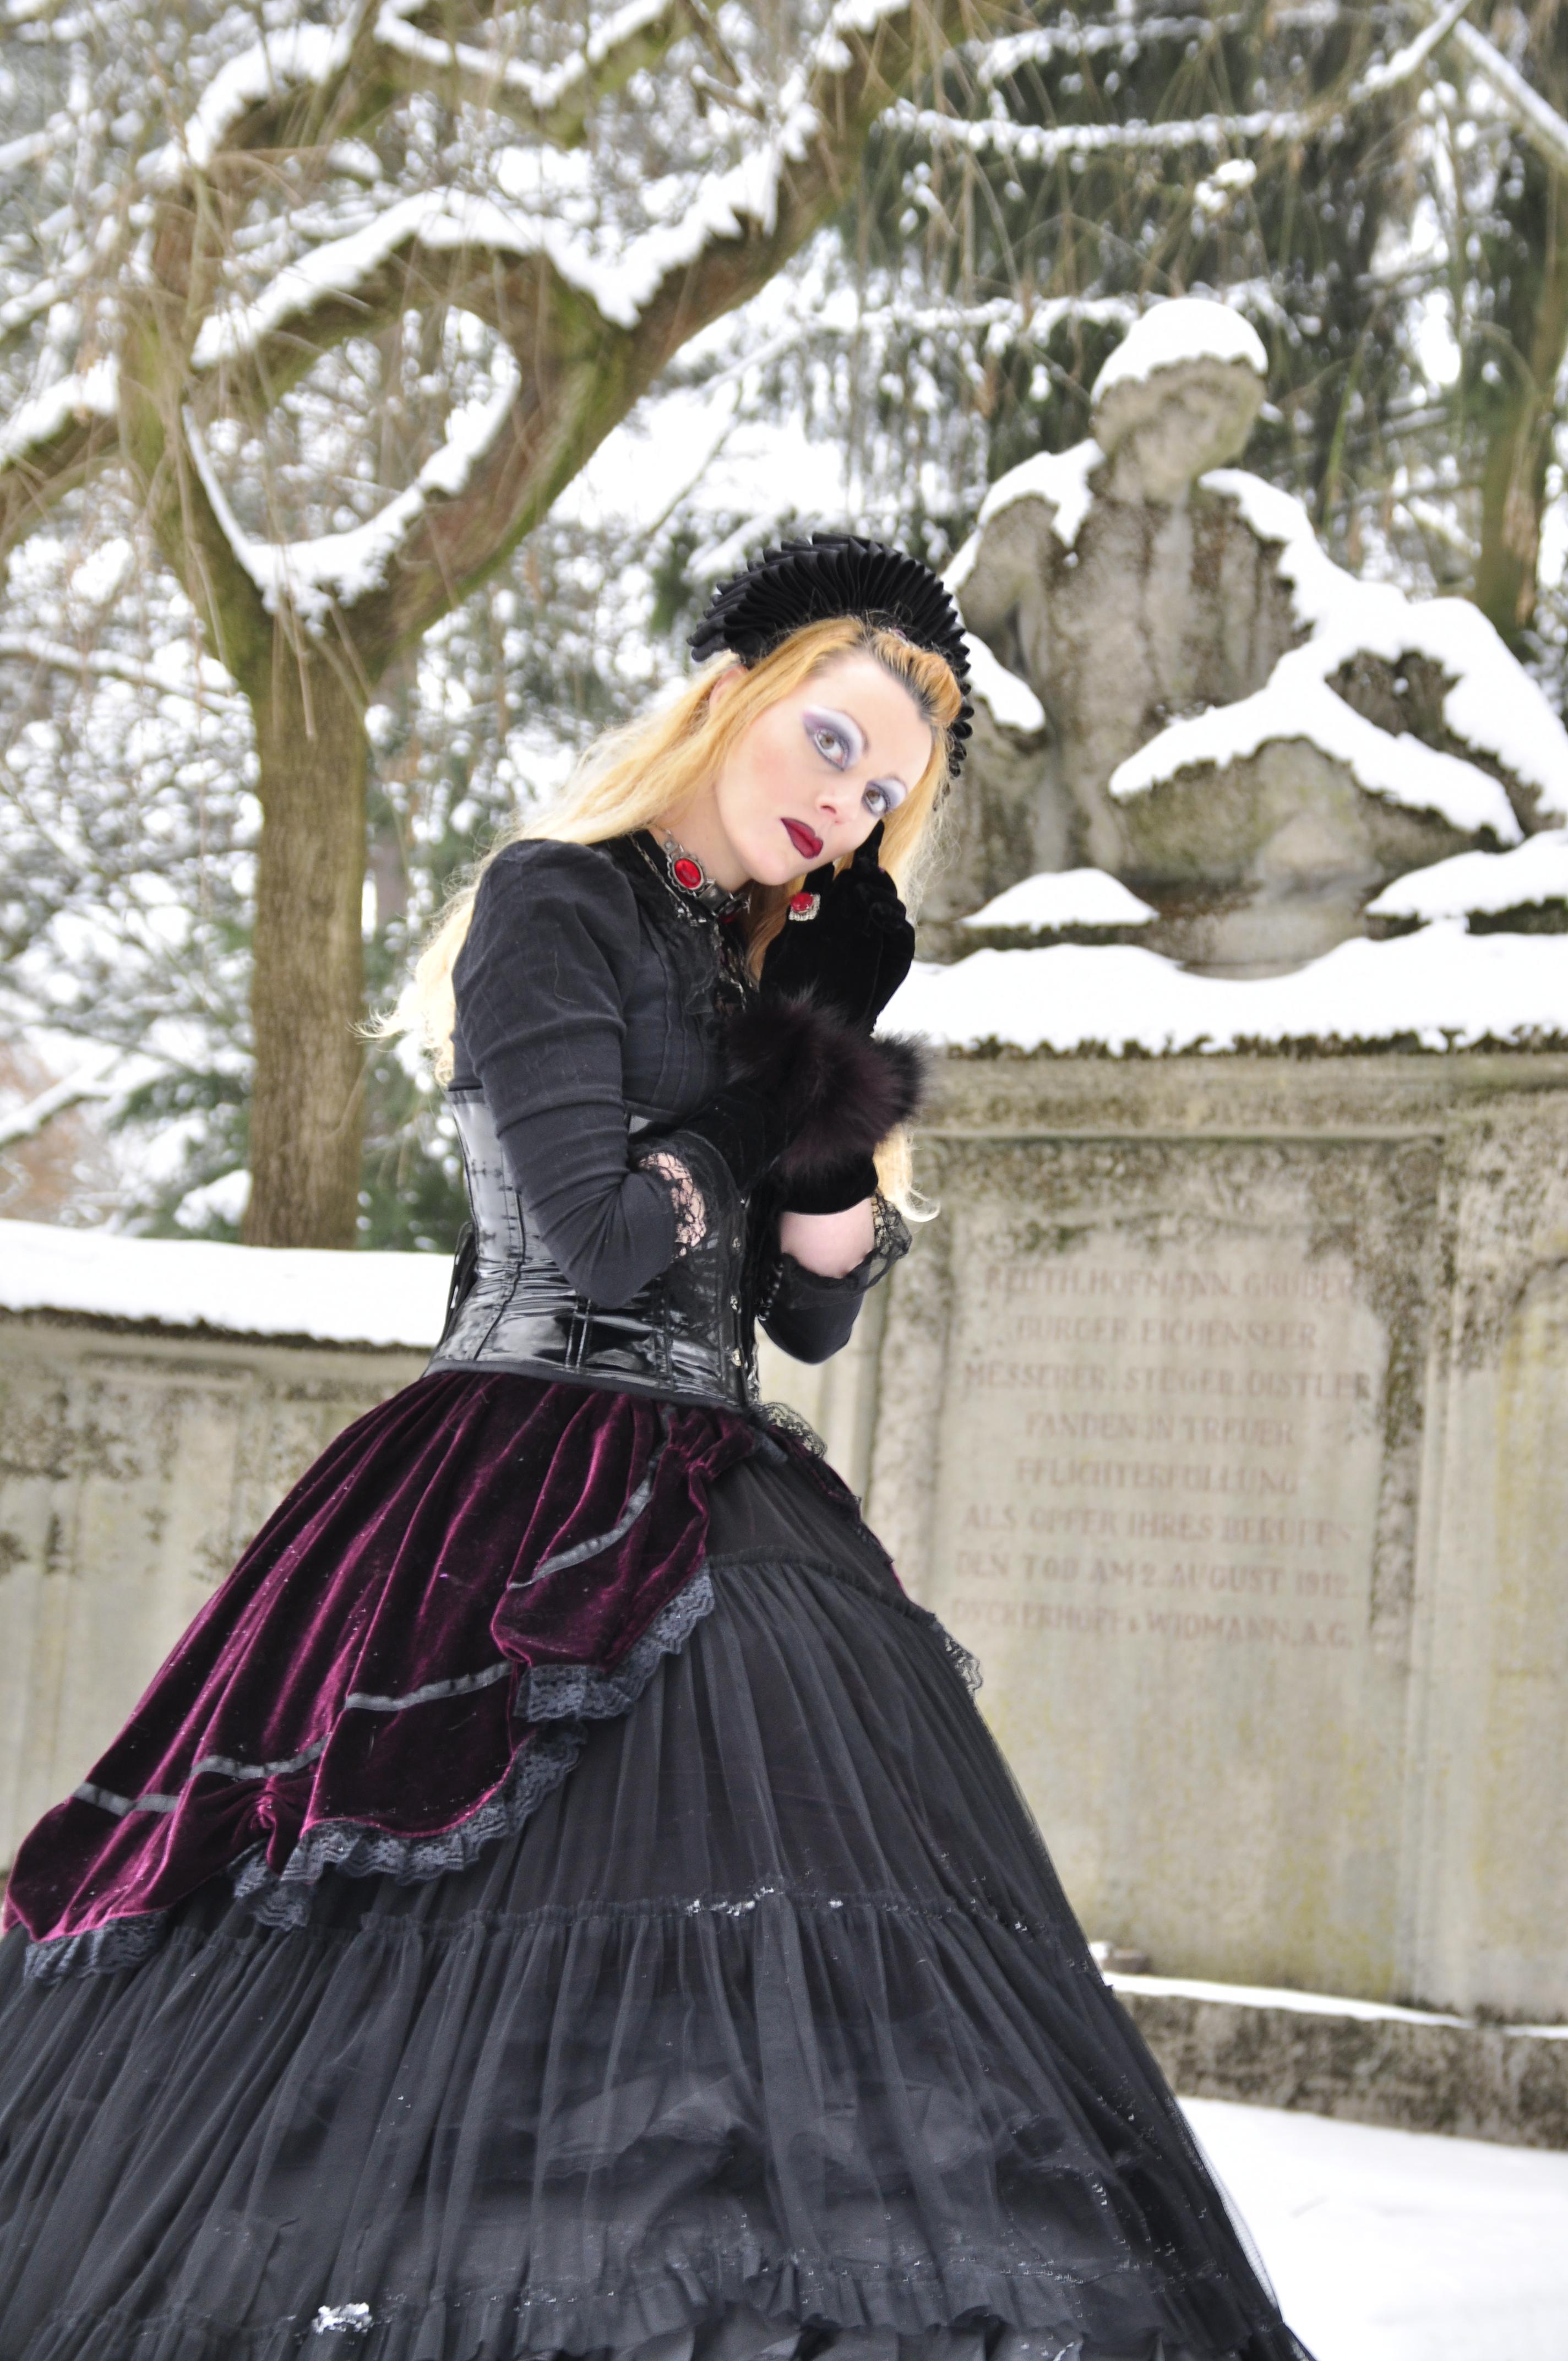 Libitina Grimm Supernatural Amino